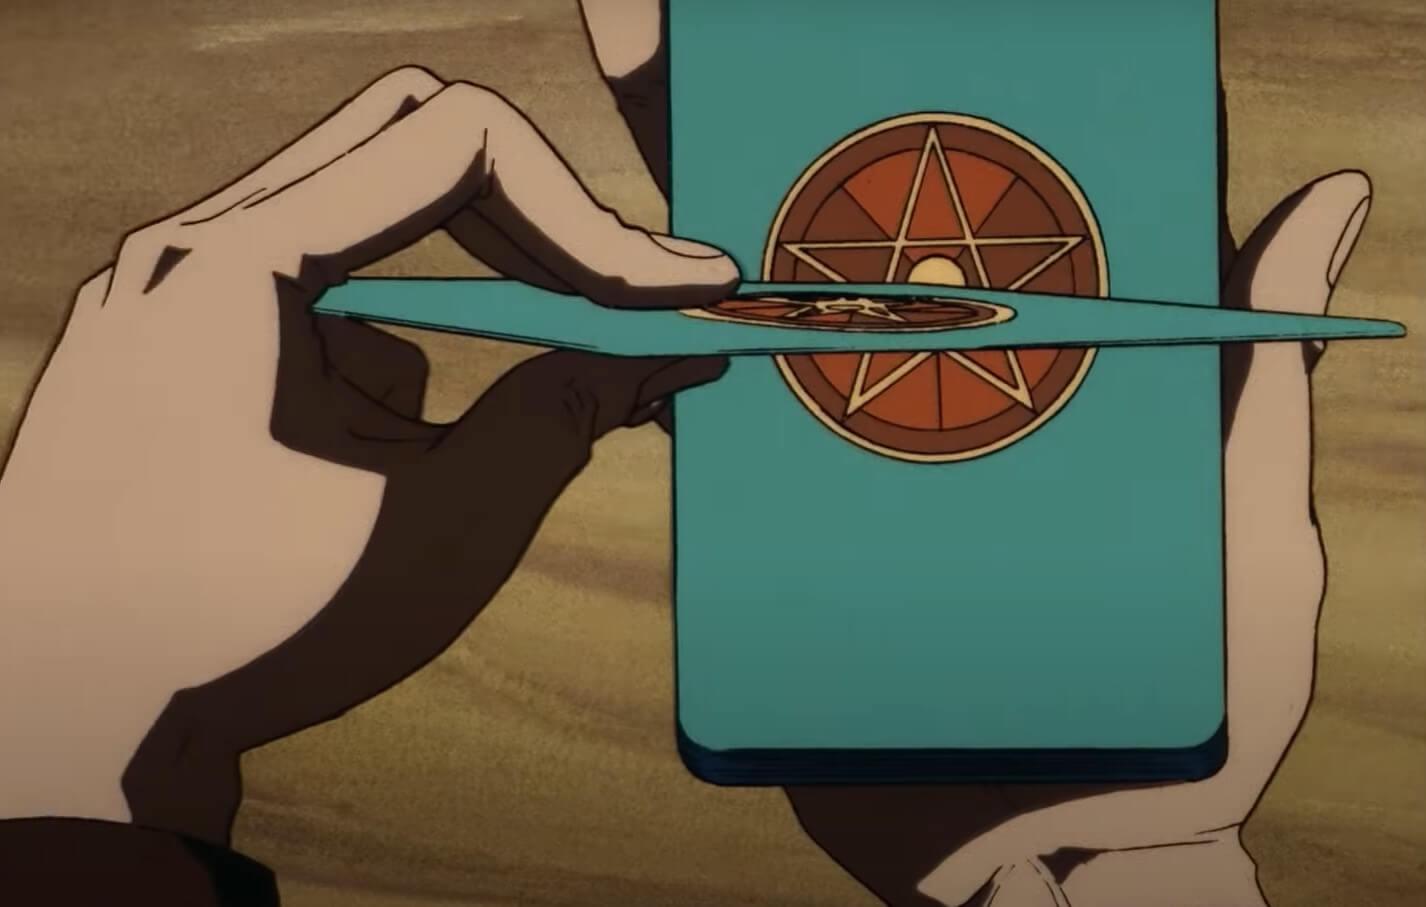 hitomi kanzaki tarot card reading